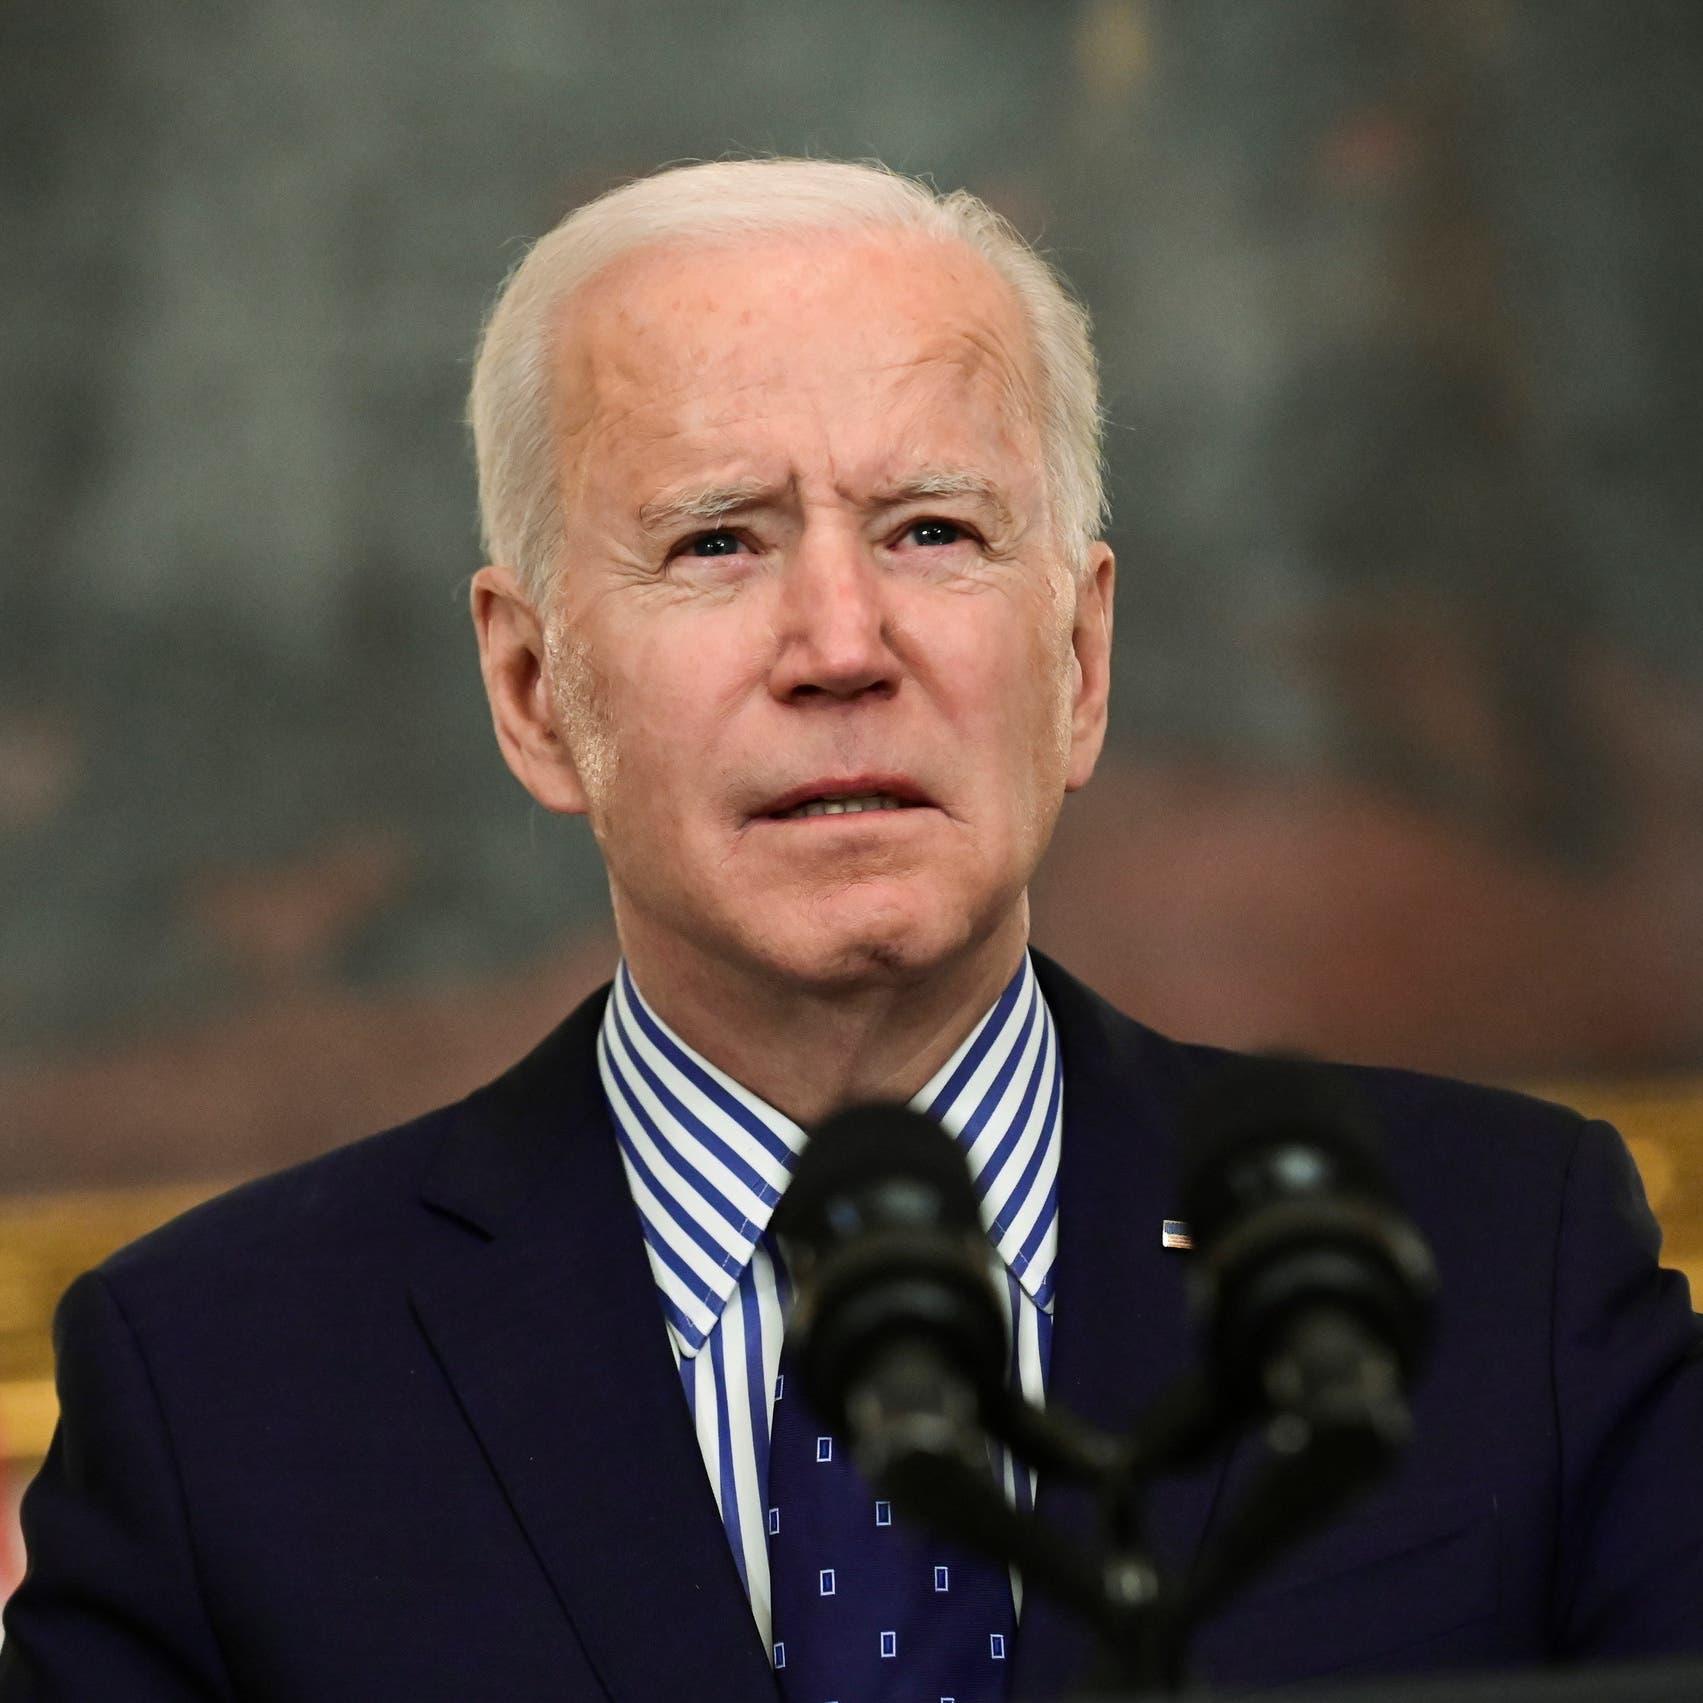 US President Biden to promote $4 trillion plans in visit to Virginia school